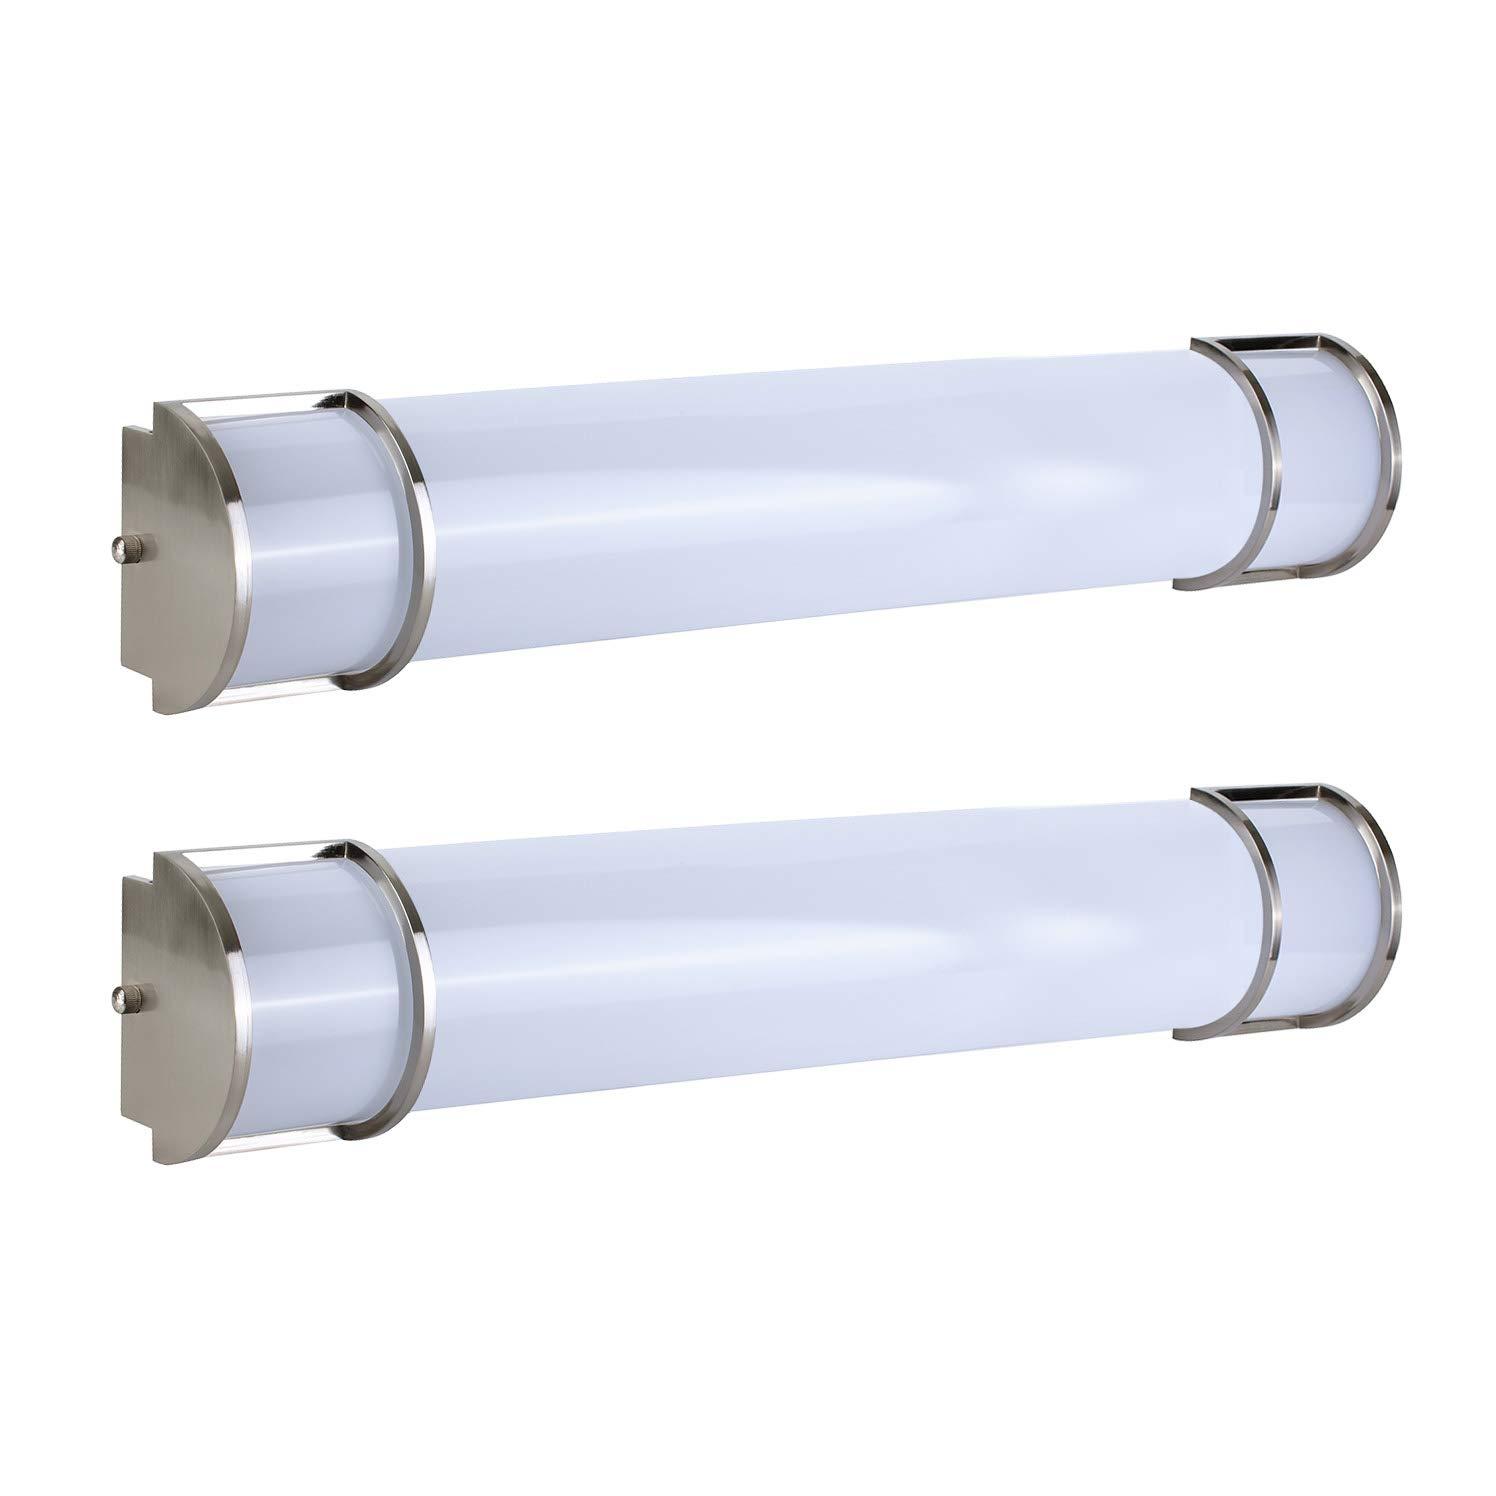 OSTWIN 24 Inch Dimmable LED Linear Bath Vanity Light Bar, Modern Bathroom Vanity Light Fixture 25W 5000K Daylight, Vertical or Horizontal Tube, Brushed Nickel Finish(2 Pack) ETL&Energy Star Listed